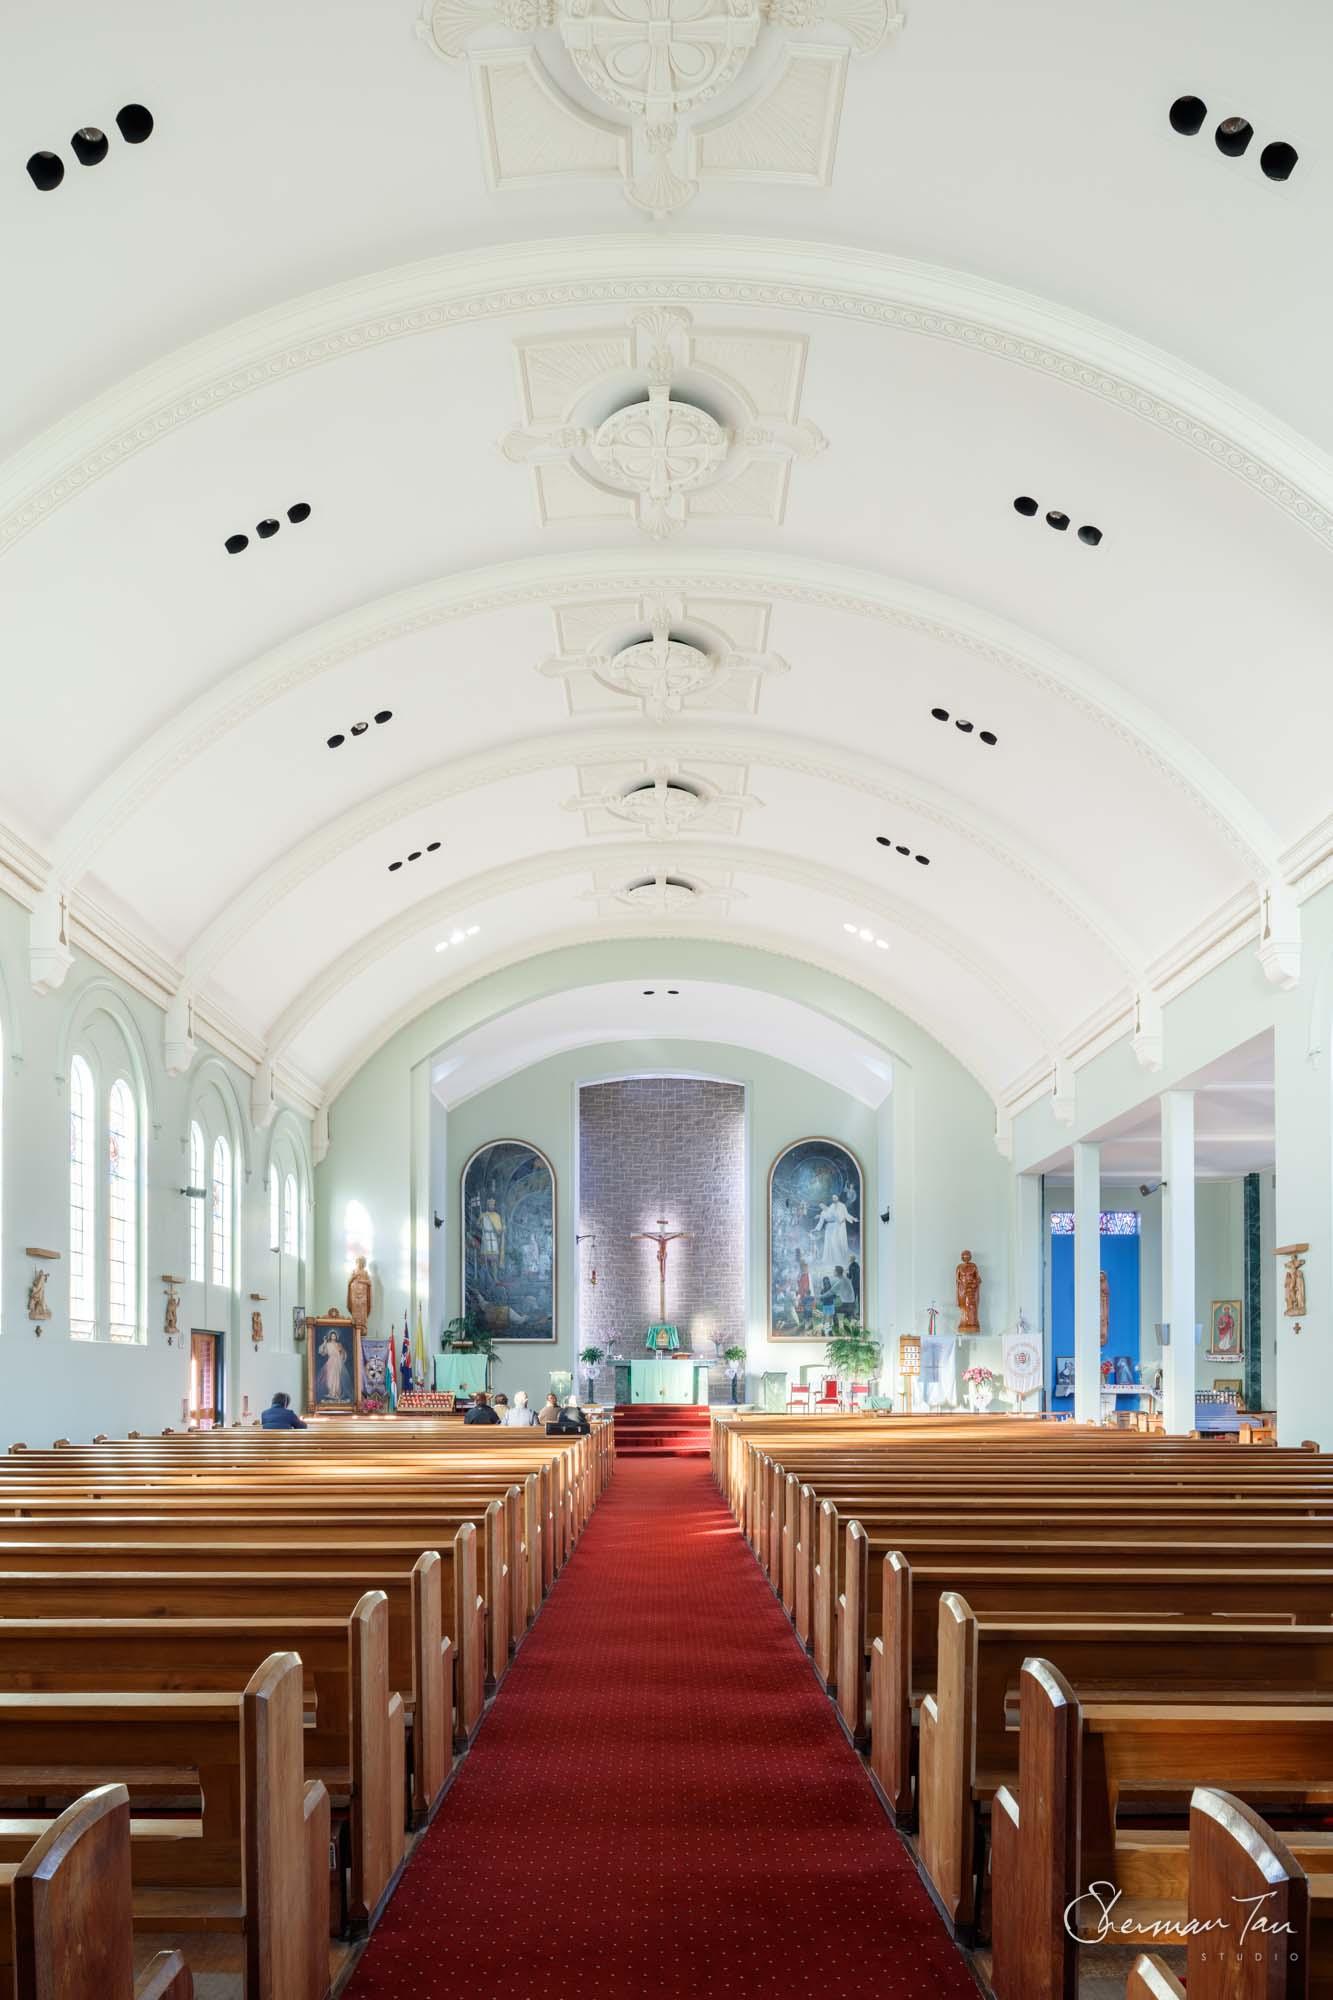 ©Sherman Tan Studio_Best Melbourne Wedding Church Venue_St Colmans Church Balaclava-031-HDR.jpg